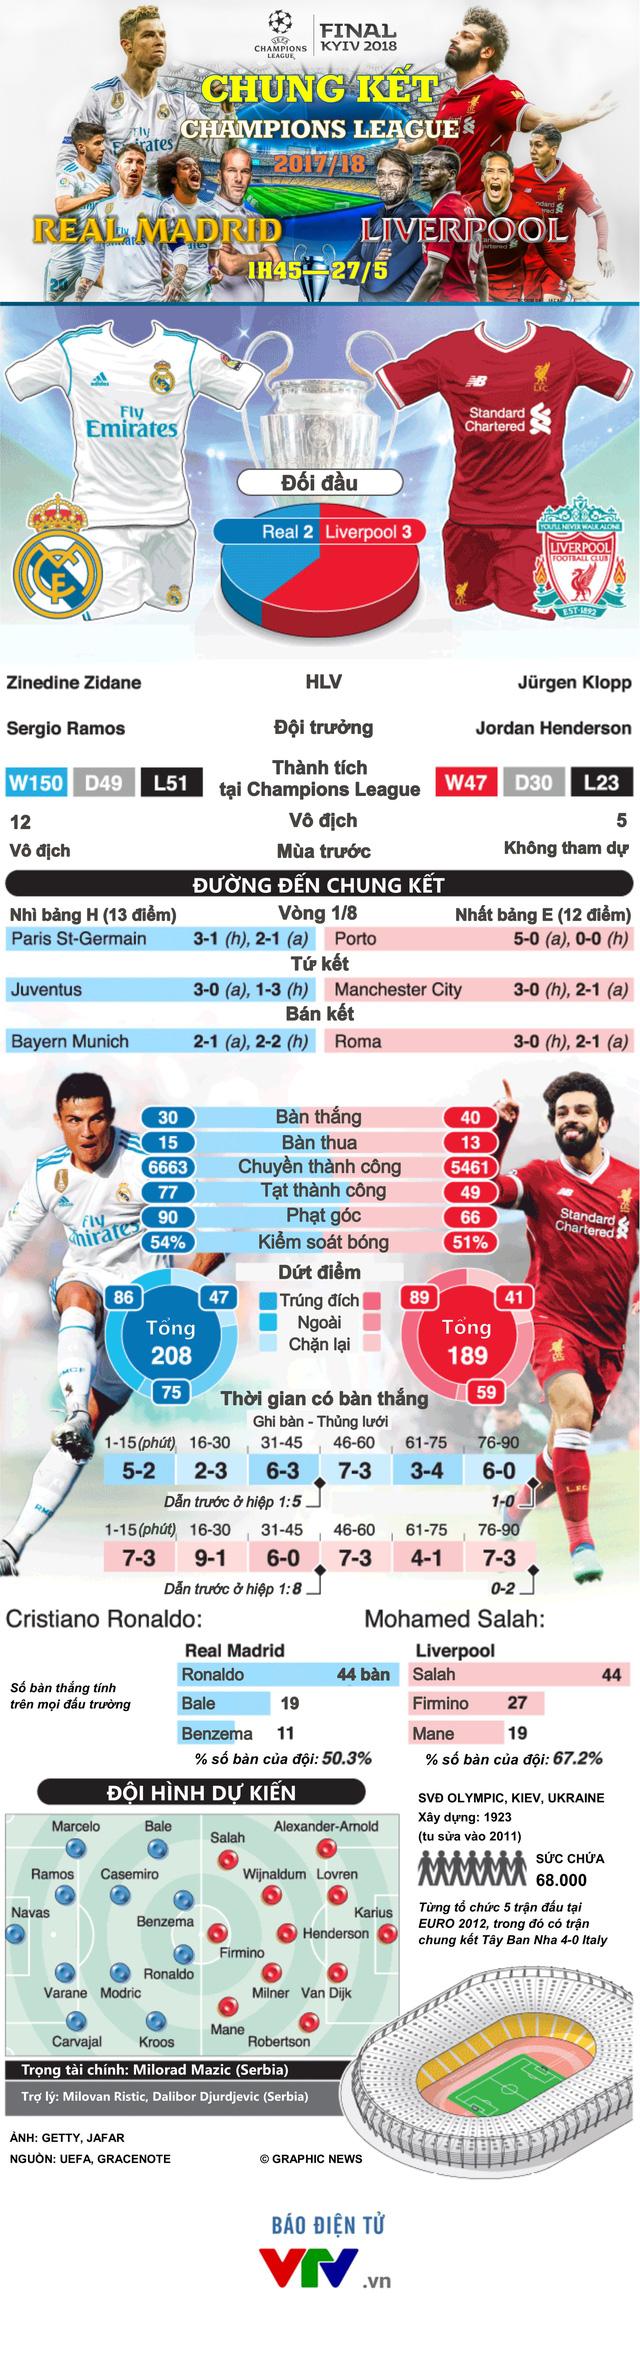 INFOGRAPHIC Chung kết Champions League, Real Madrid - Liverpool: Ngưỡng cửa của lịch sử - Ảnh 1.